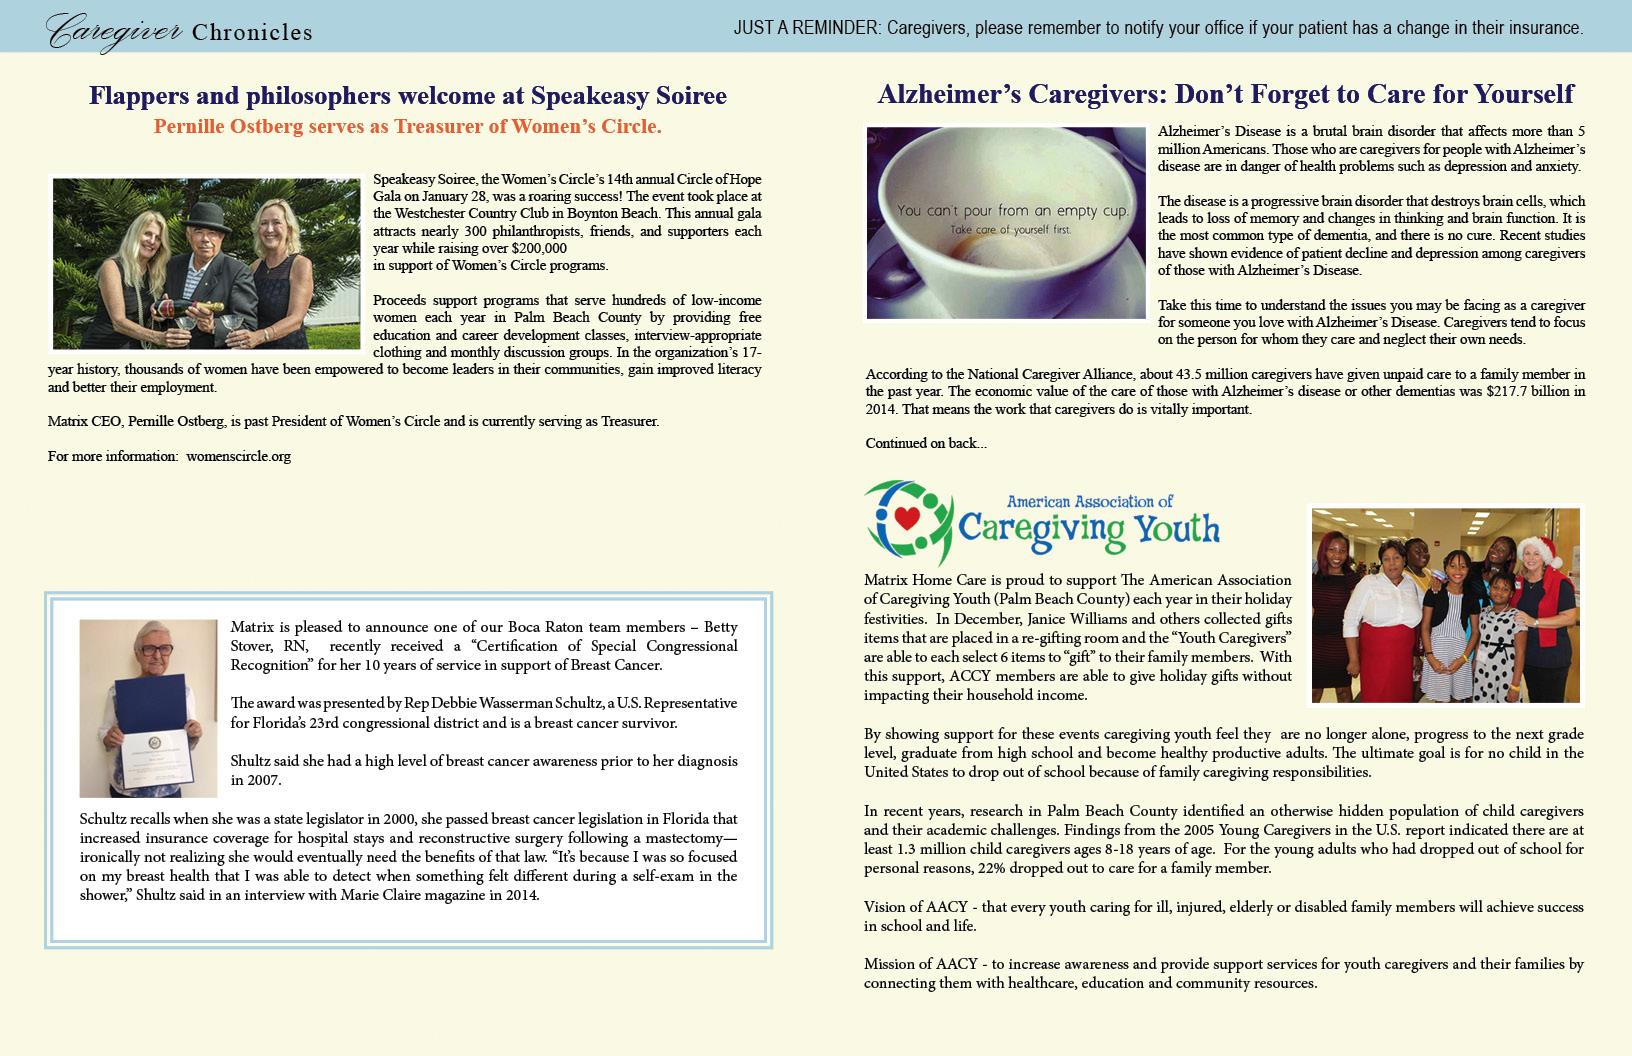 Matrix Home Care Winter Newsletter